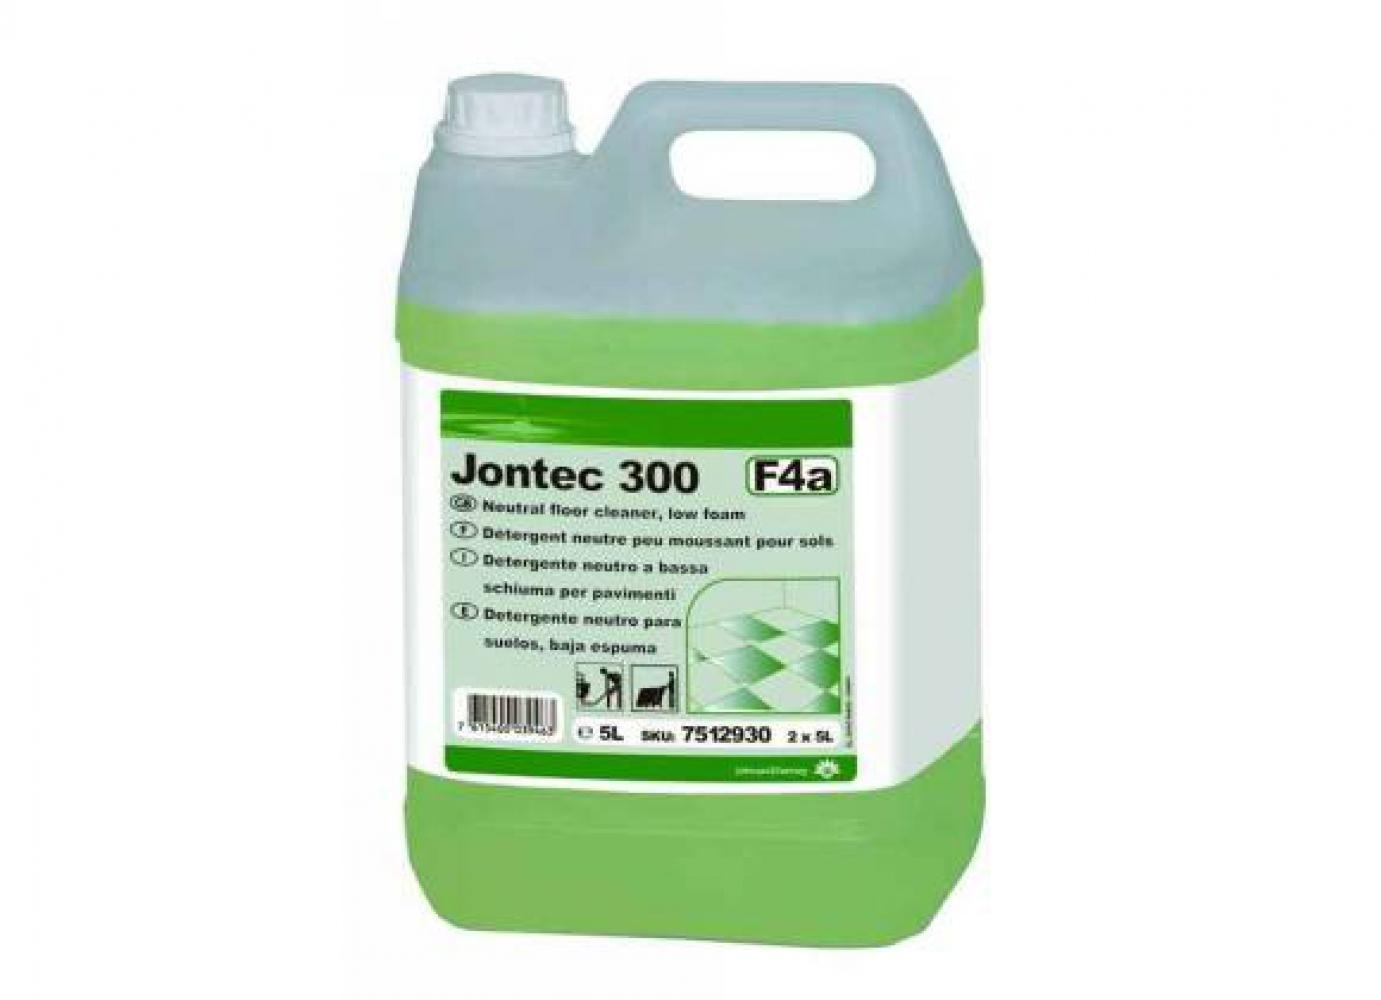 Acquista 2 Pezzi Jontec 300 Detergente 17545838 | Glooke.com